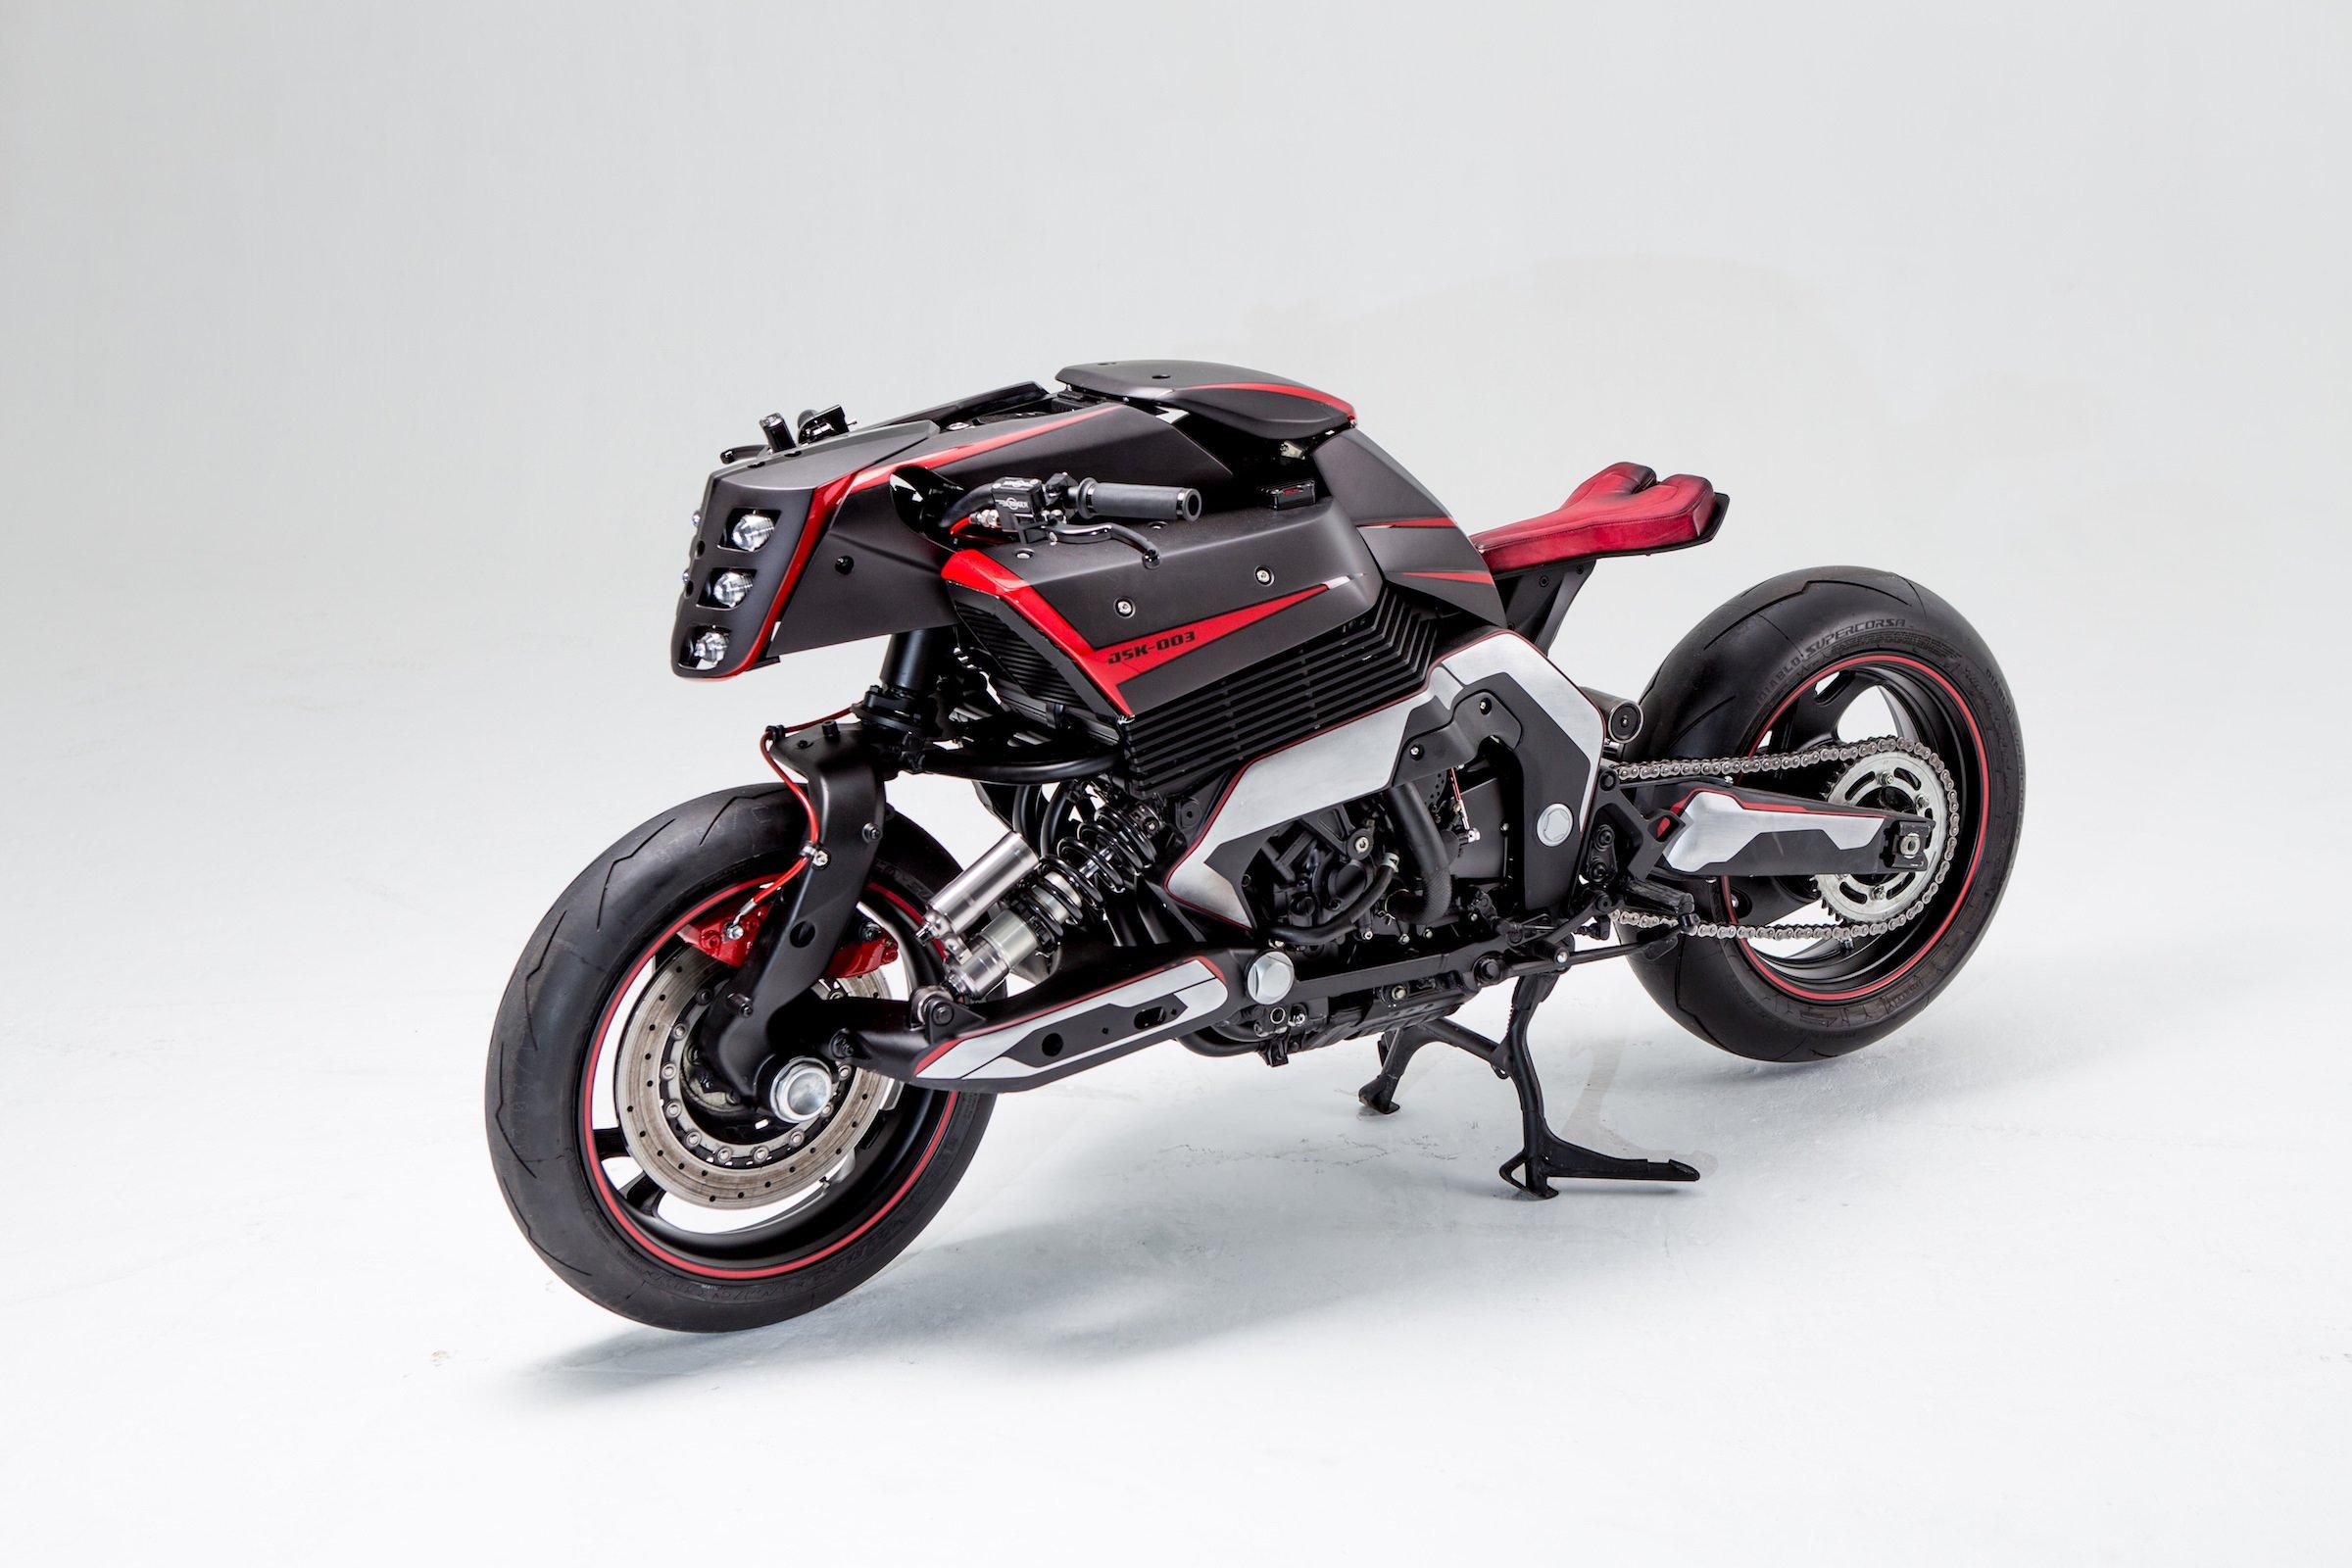 2018 Yamaha Motorcycles >> The JSK Moto Co. Custom Yamaha GTS 1000 - Project Rhodium Omega